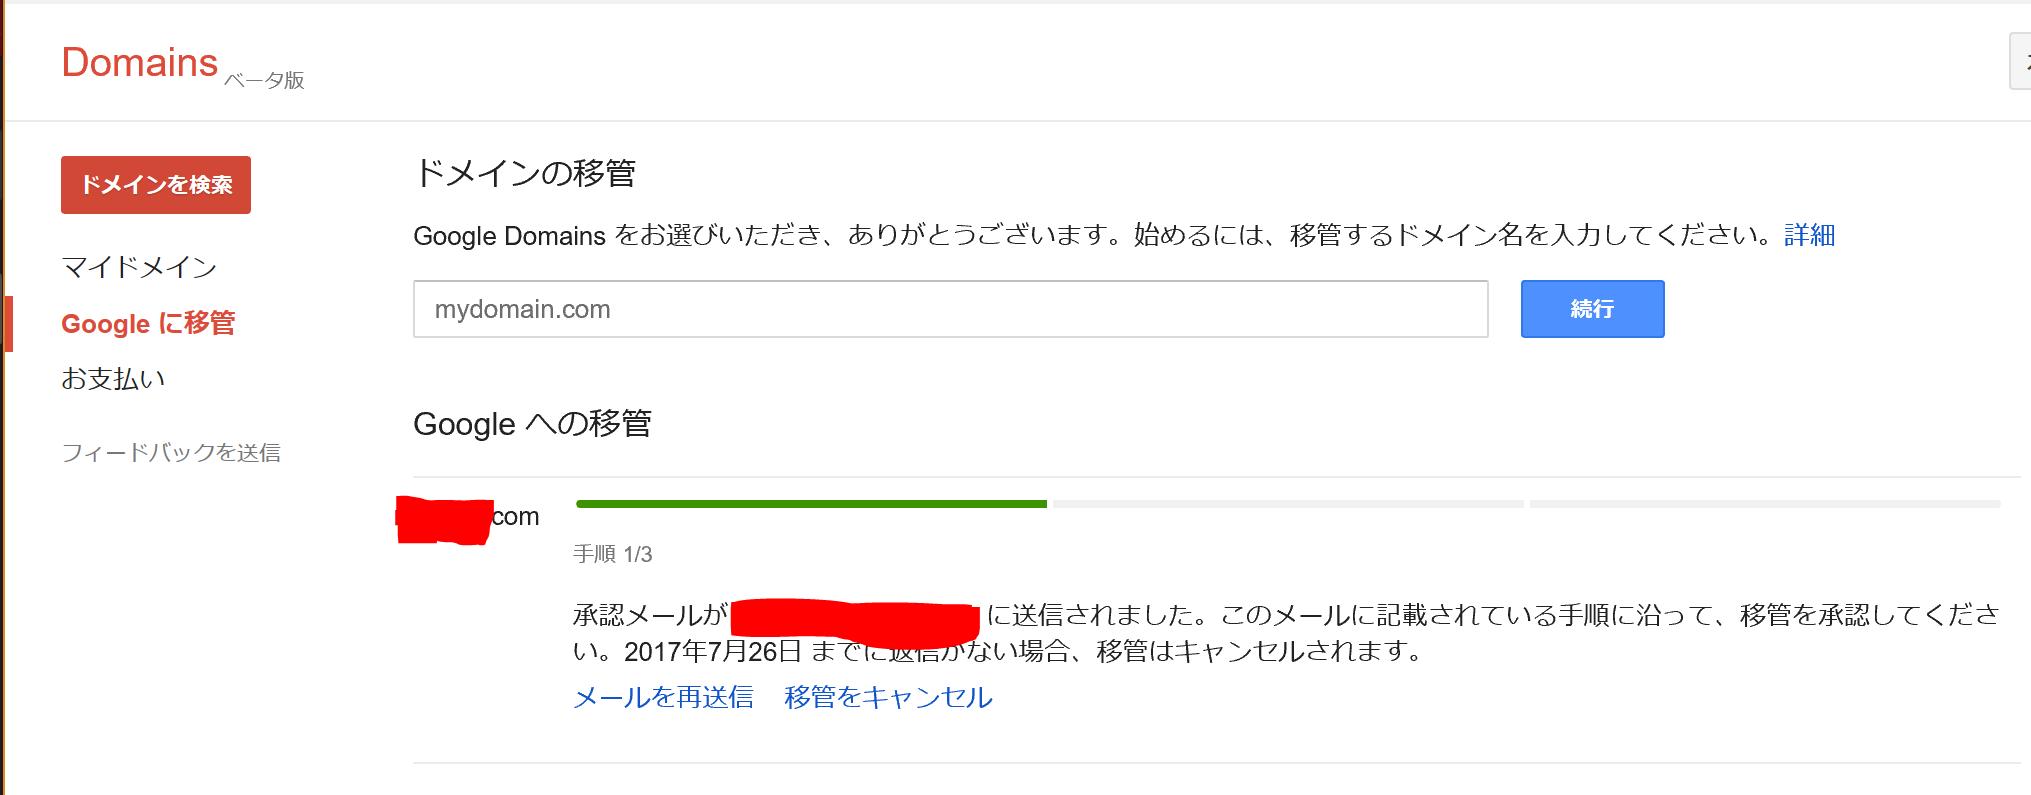 domains10.PNG